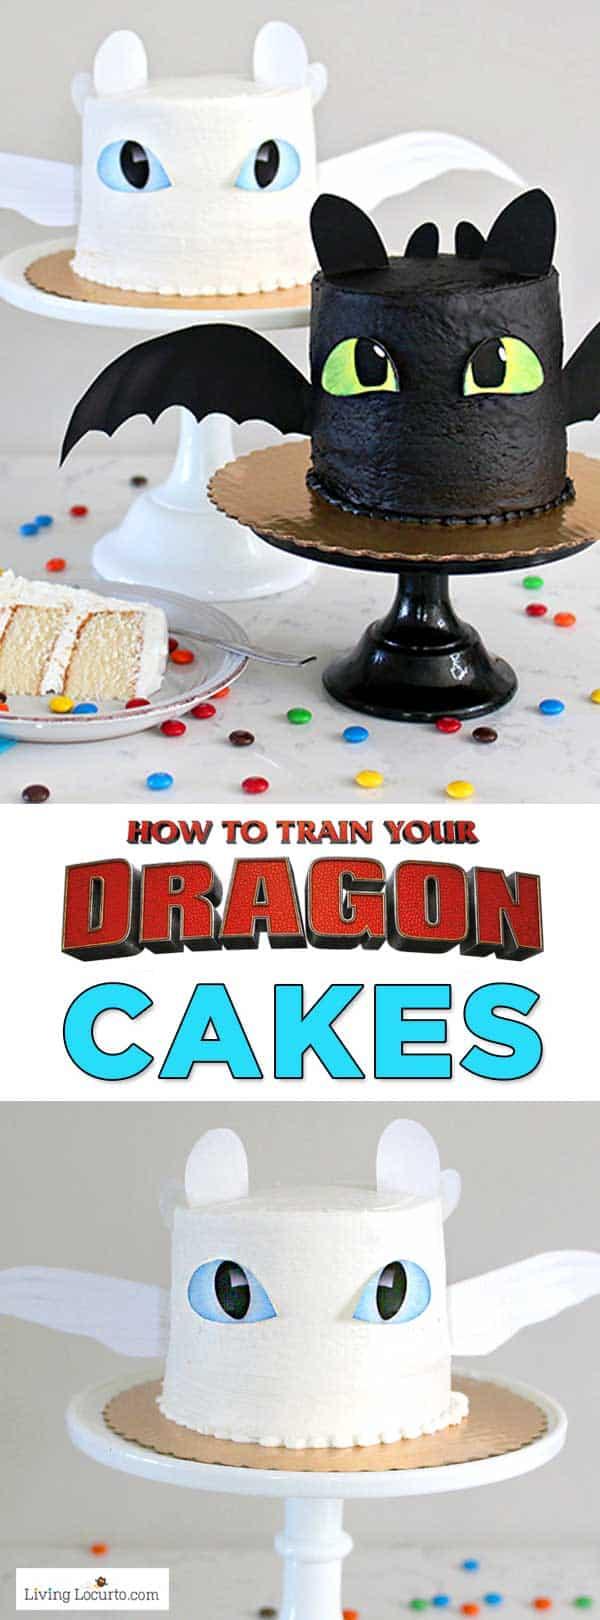 Easy How To Train Your Dragon Cake Tutorial! Fluffy white cake recipe for a Night Fury or Light Fury dragon cake. A perfect birthday party cake! LivingLocurto.com #cake #dragon #recipe